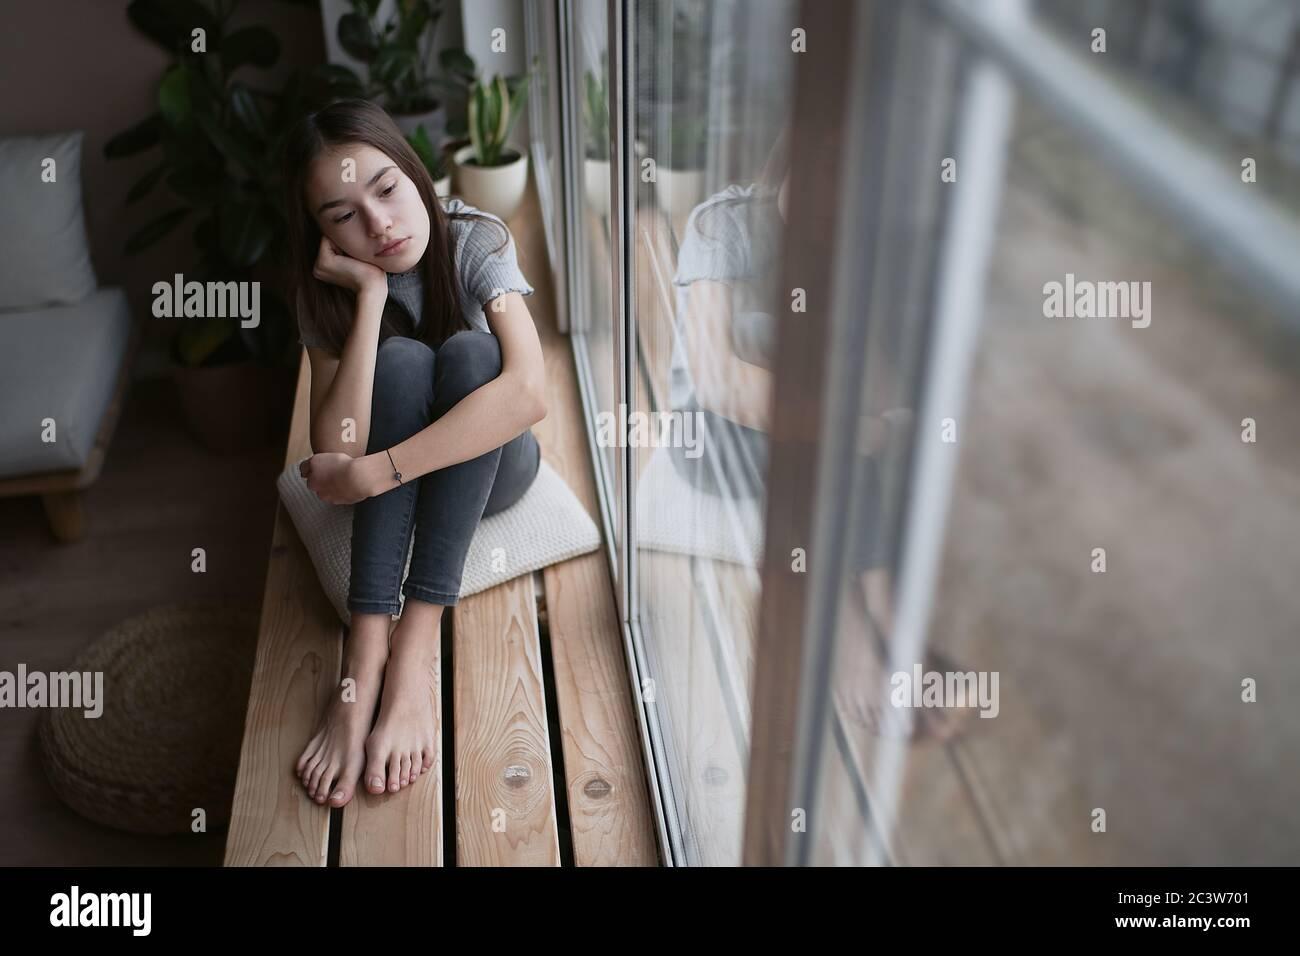 Sad Teenager Feeling Bad Alone Feeling Depressed Regrets Of Mistake Having Problems Adolescent Girl With Broken Heart Stock Photo Alamy